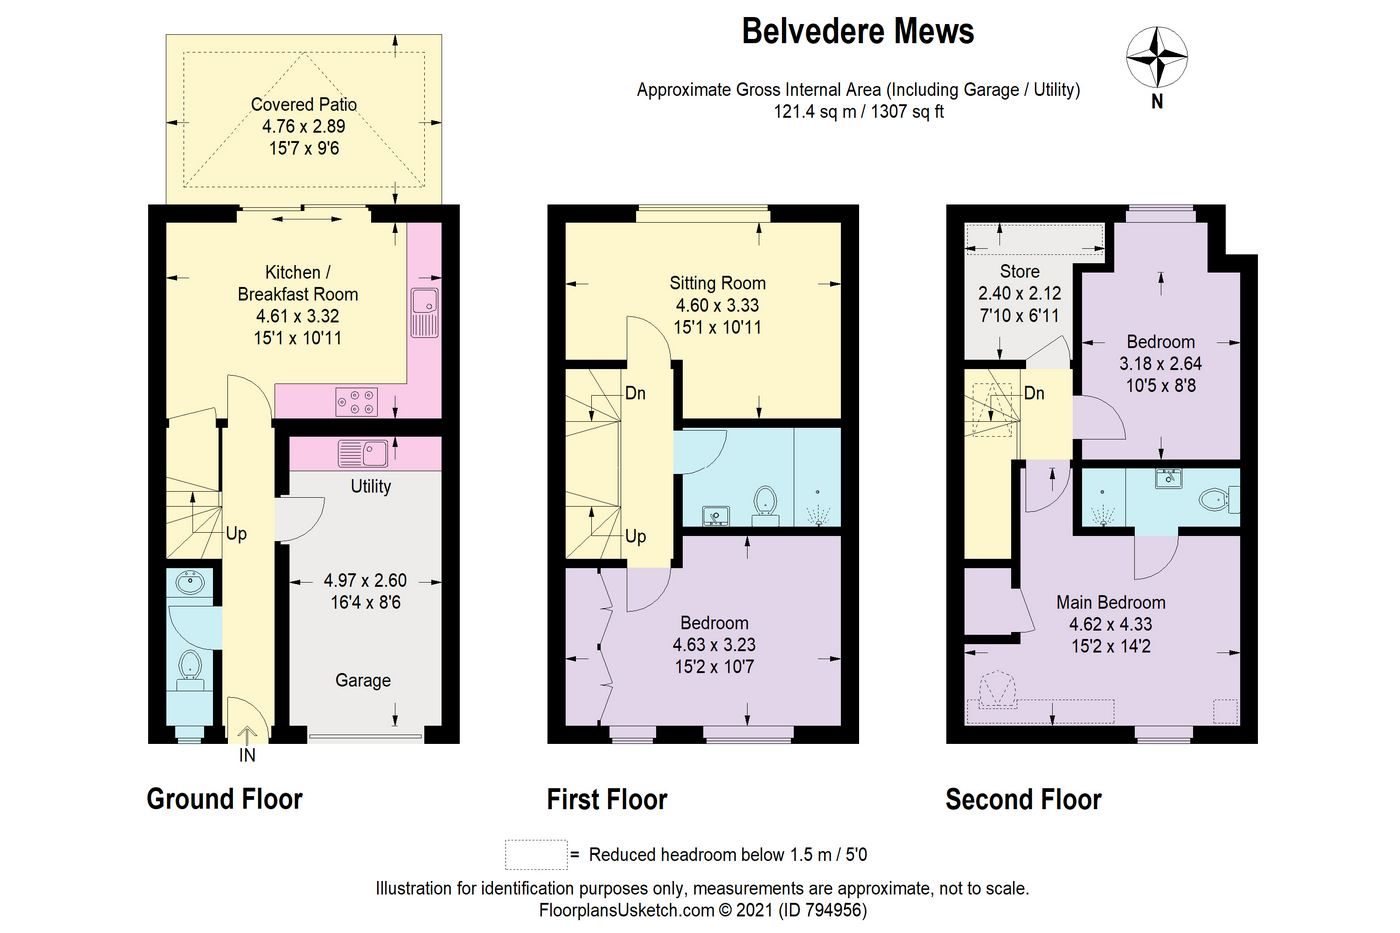 Final_794956_Belvedere-Mews-_080921151520720